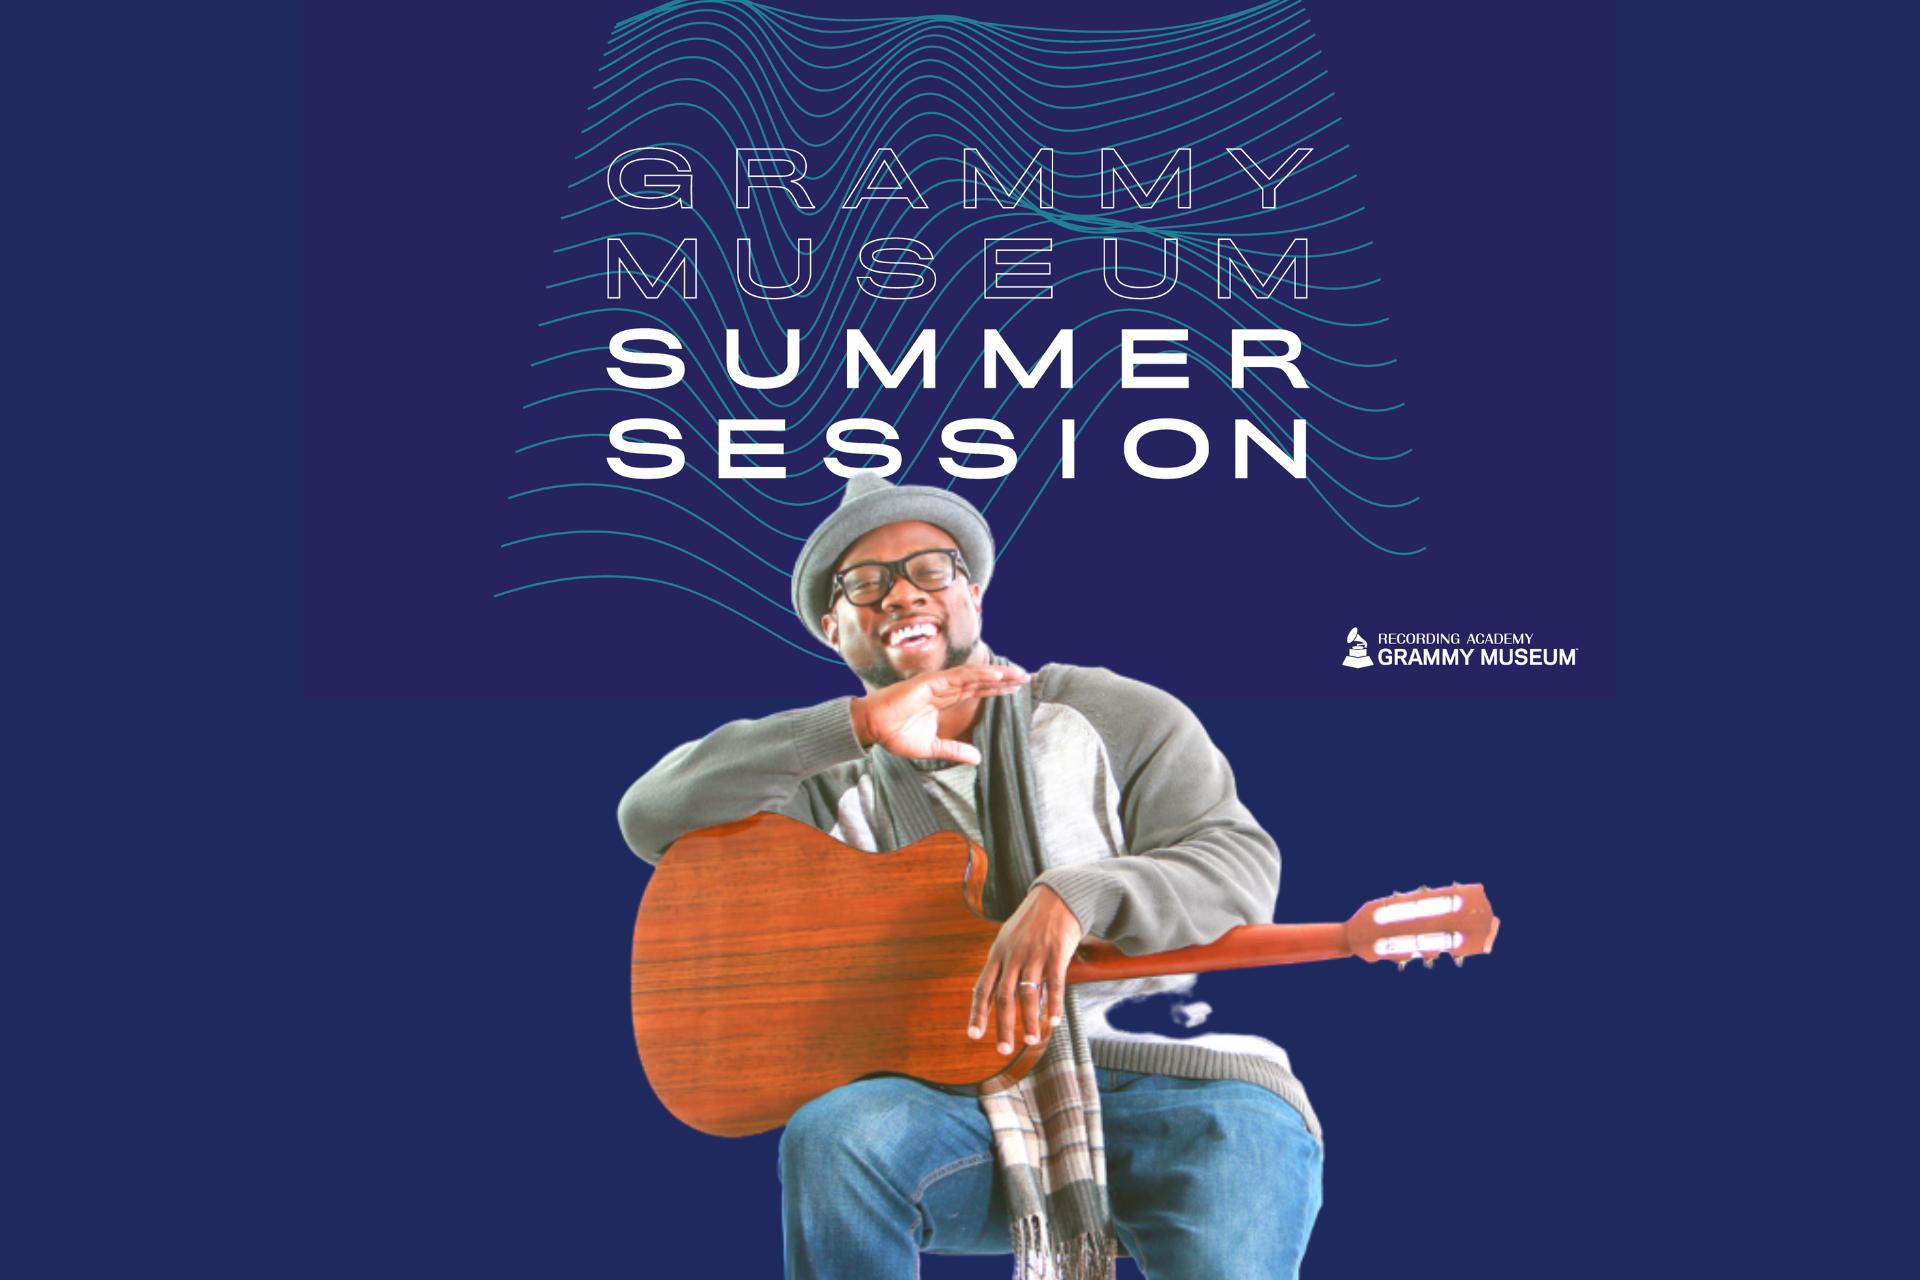 Grammy Museum Gets Sneak Peak of SaulPaul's New Album